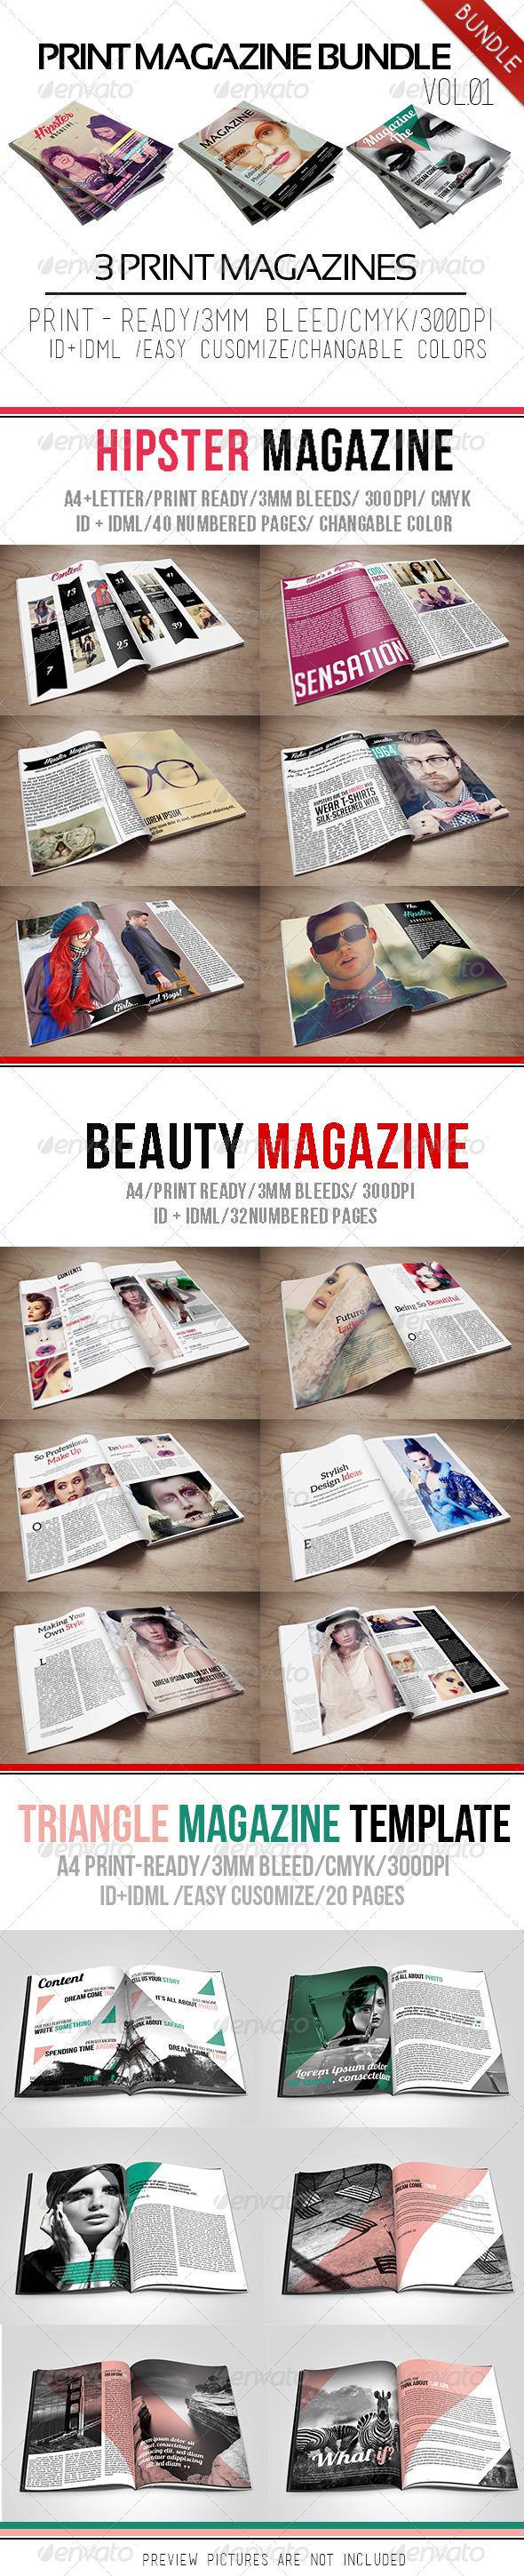 Print Magazine Bundle Vol.01 - Magazines Print Templates